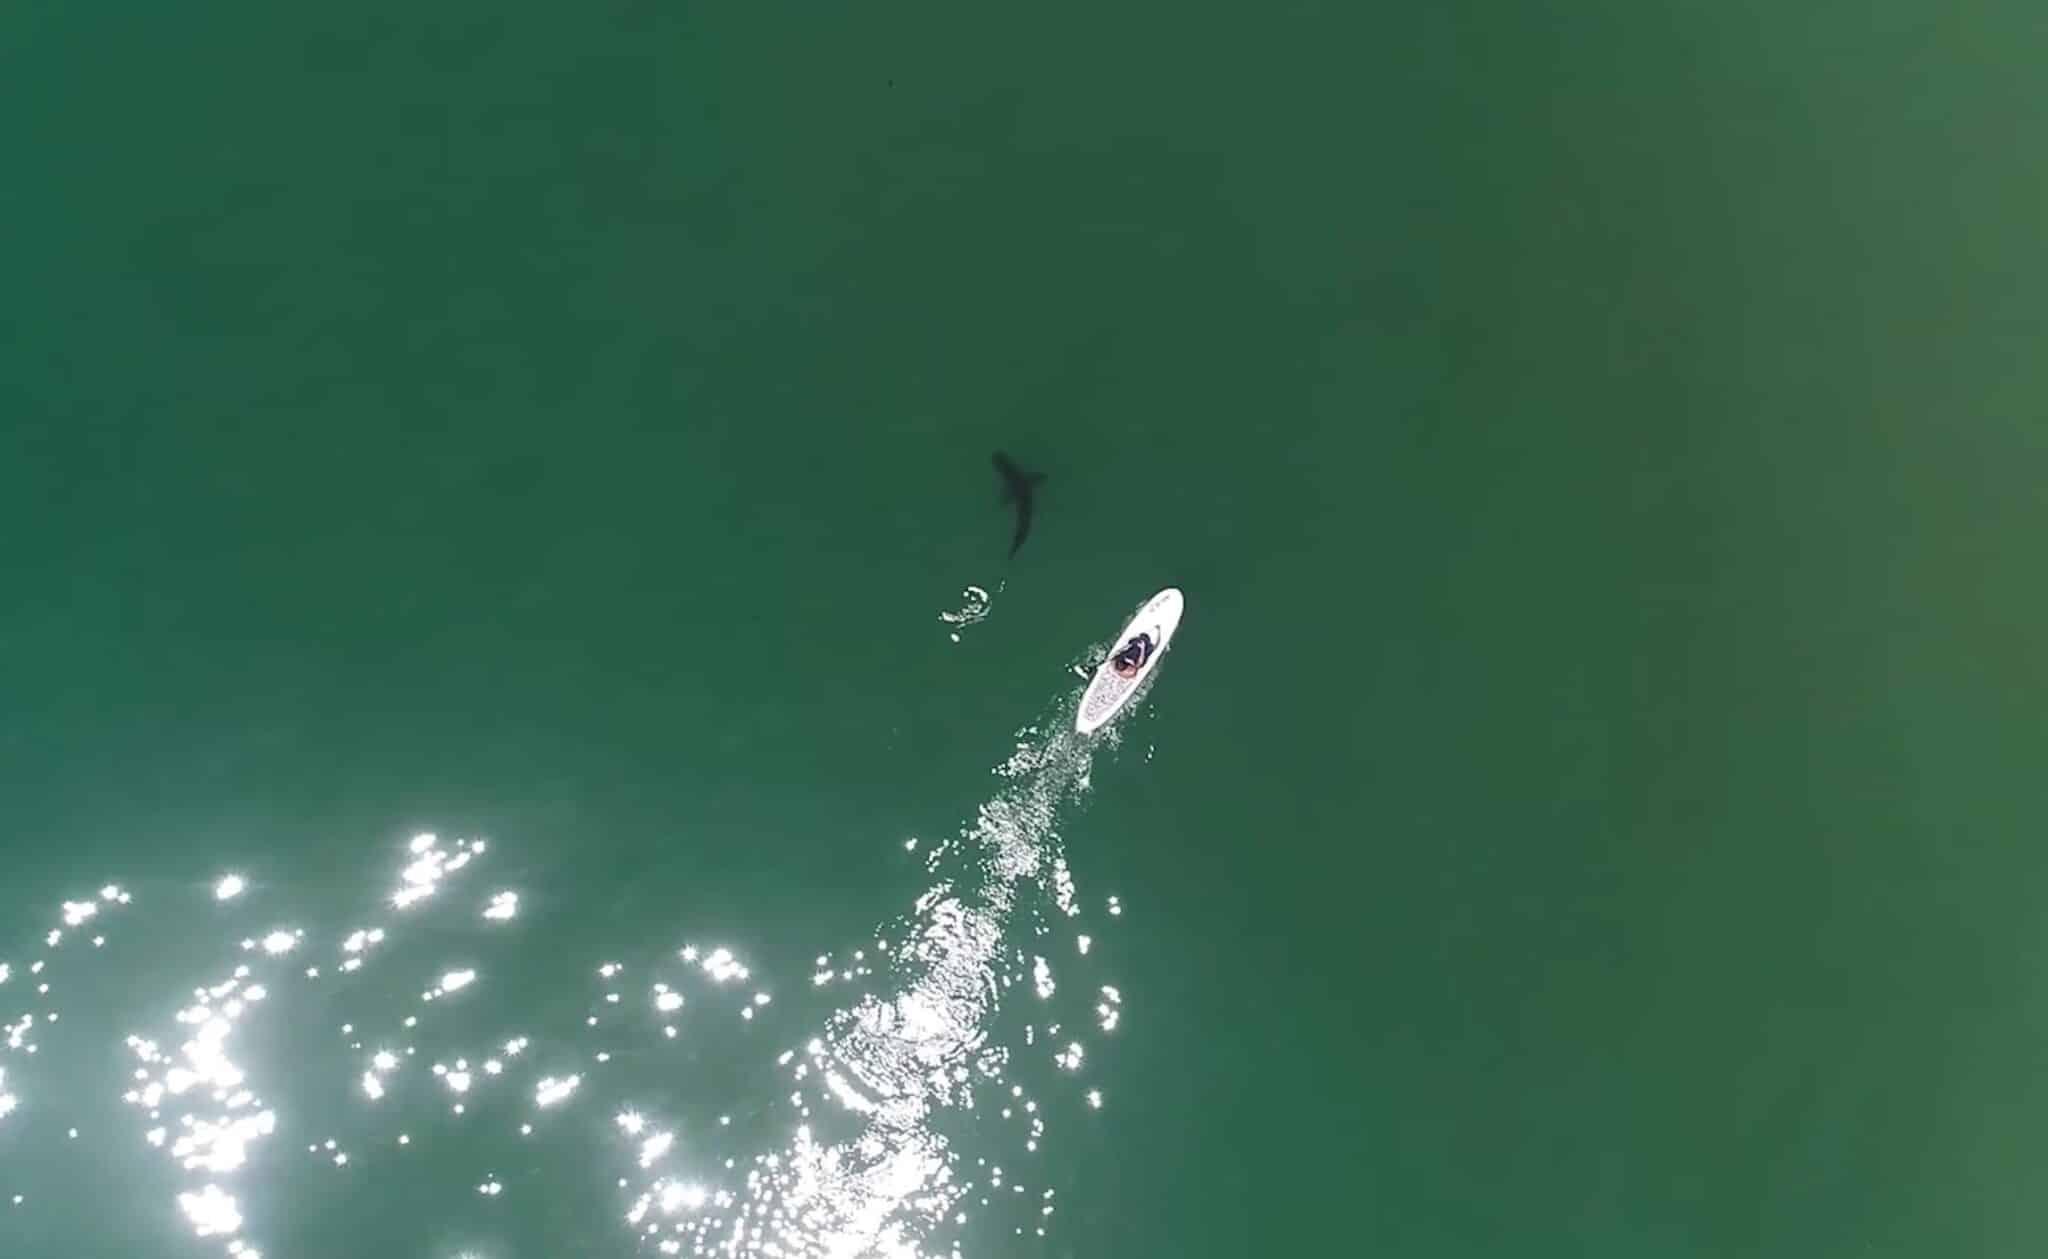 Drone program in development to detect sharks along California coastline